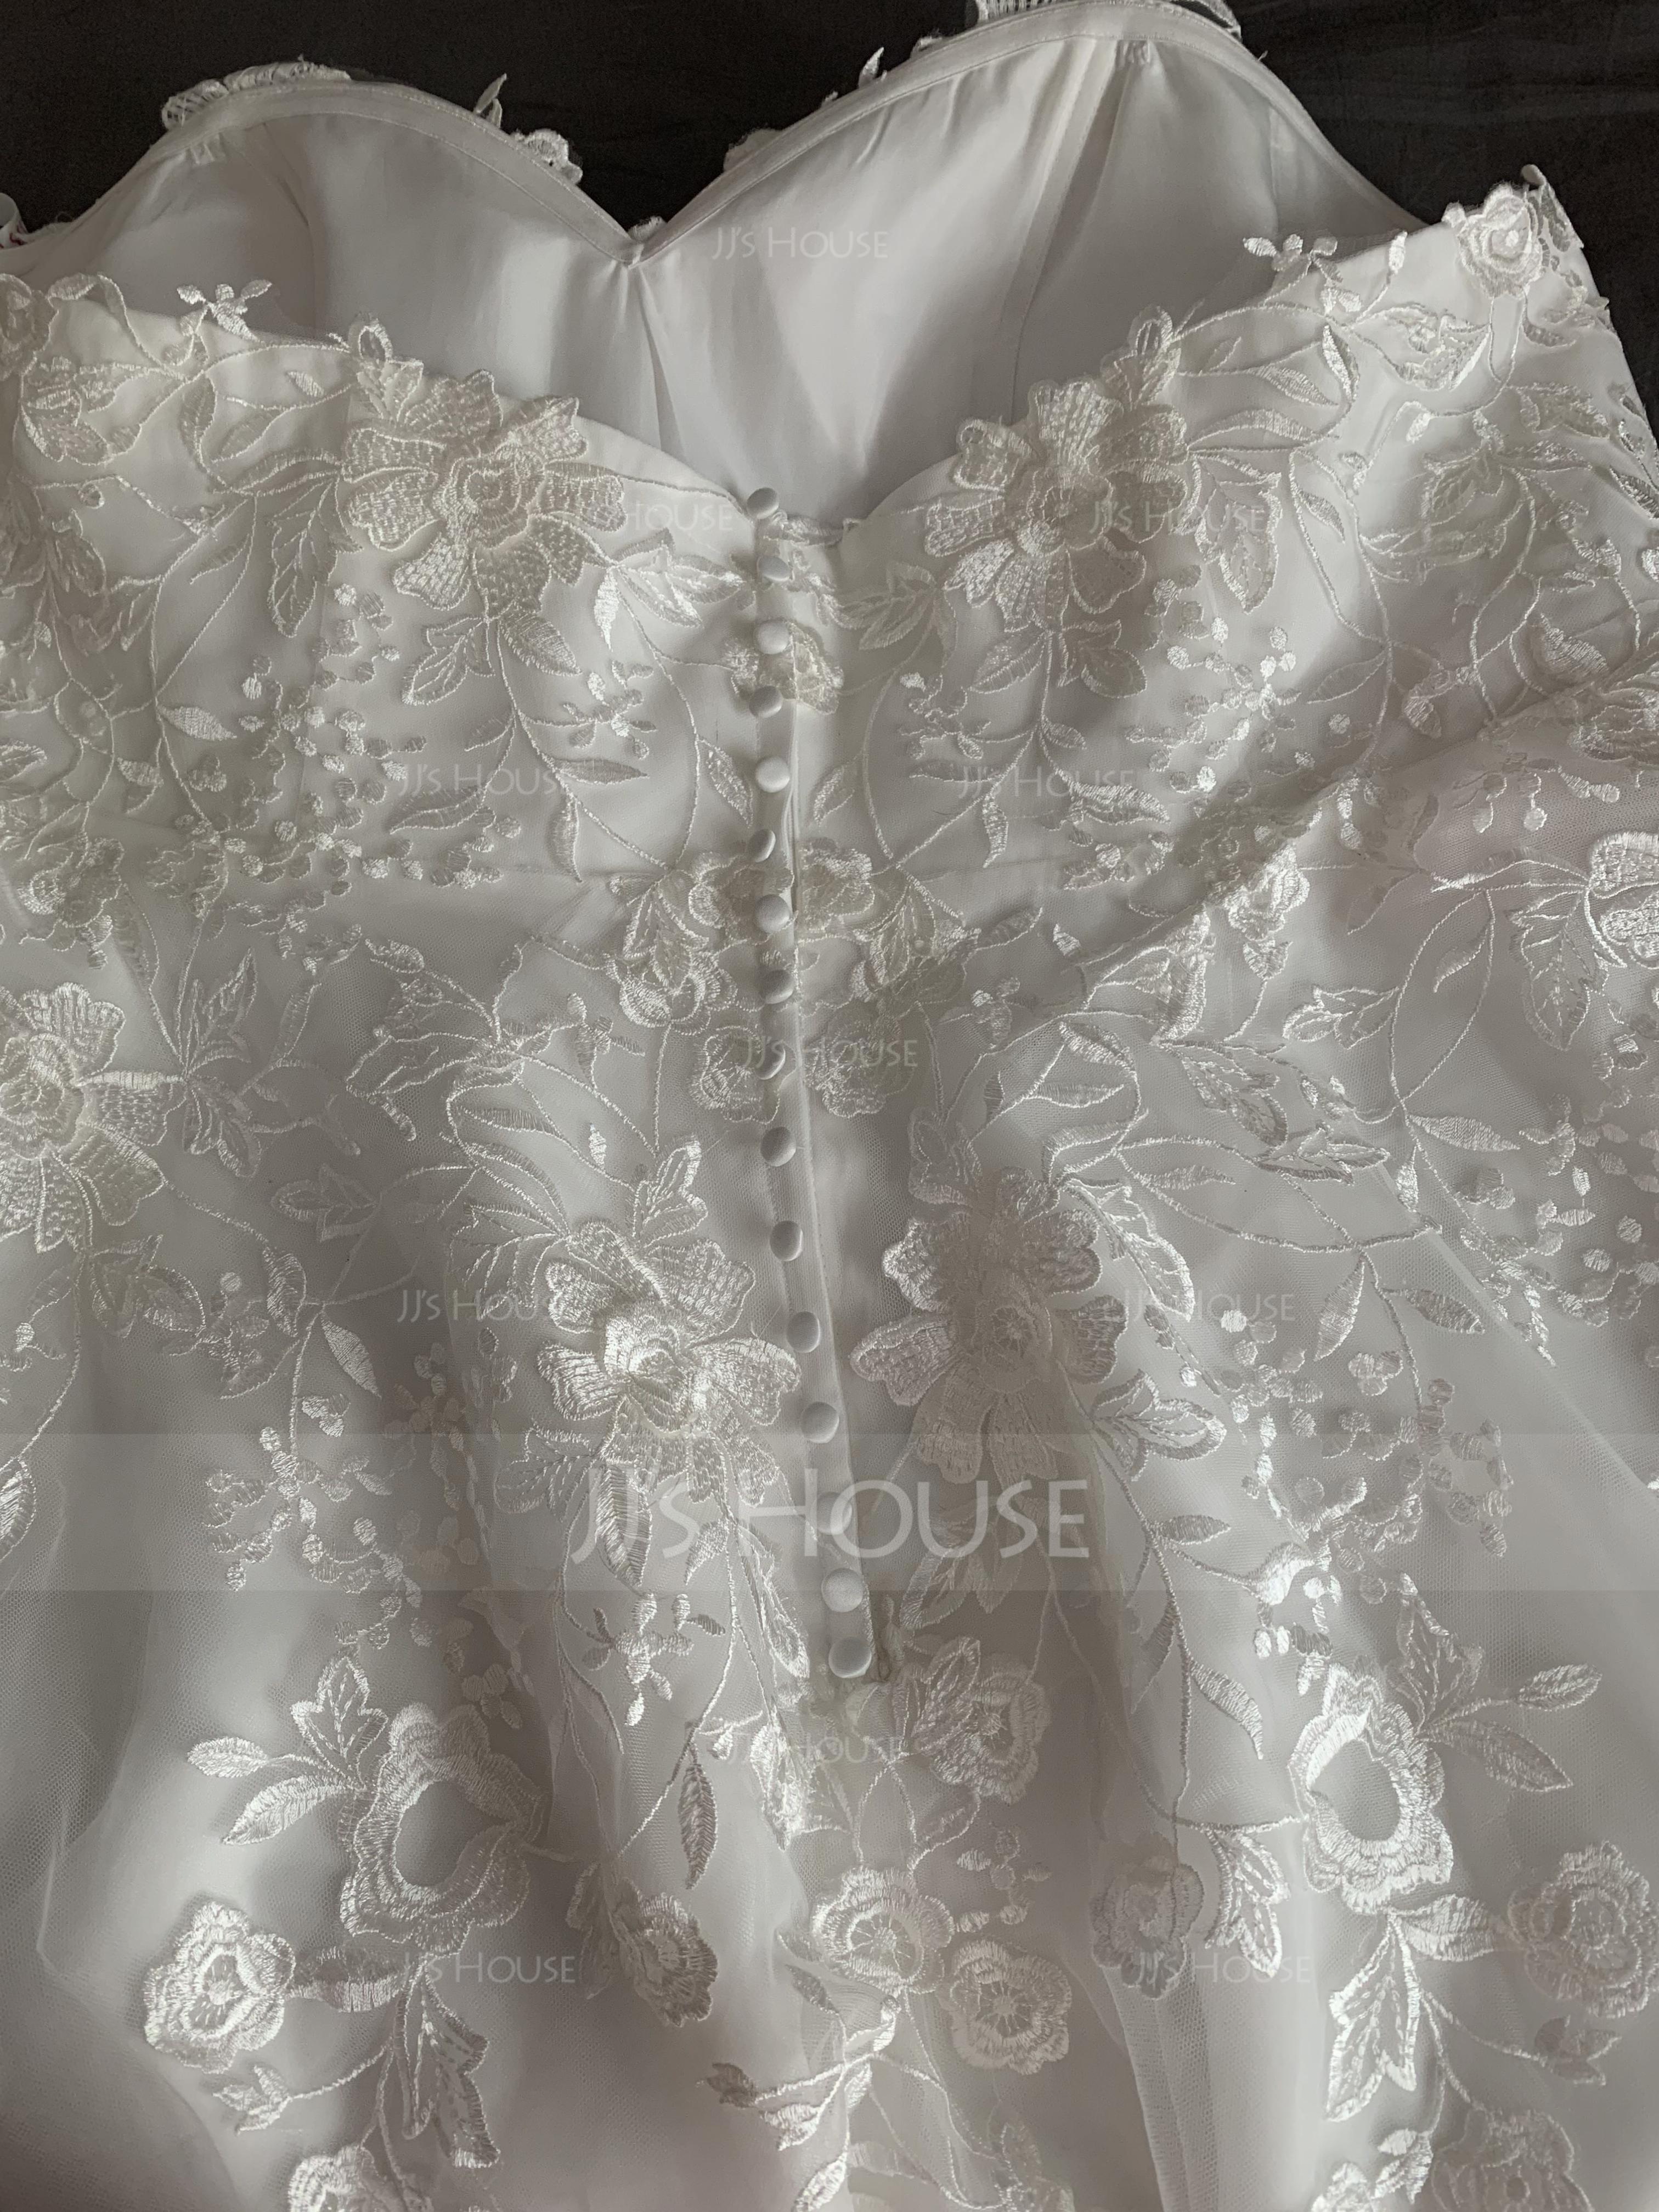 Ball-Gown/Princess Sweetheart Court Train Tulle Wedding Dress (002186389)